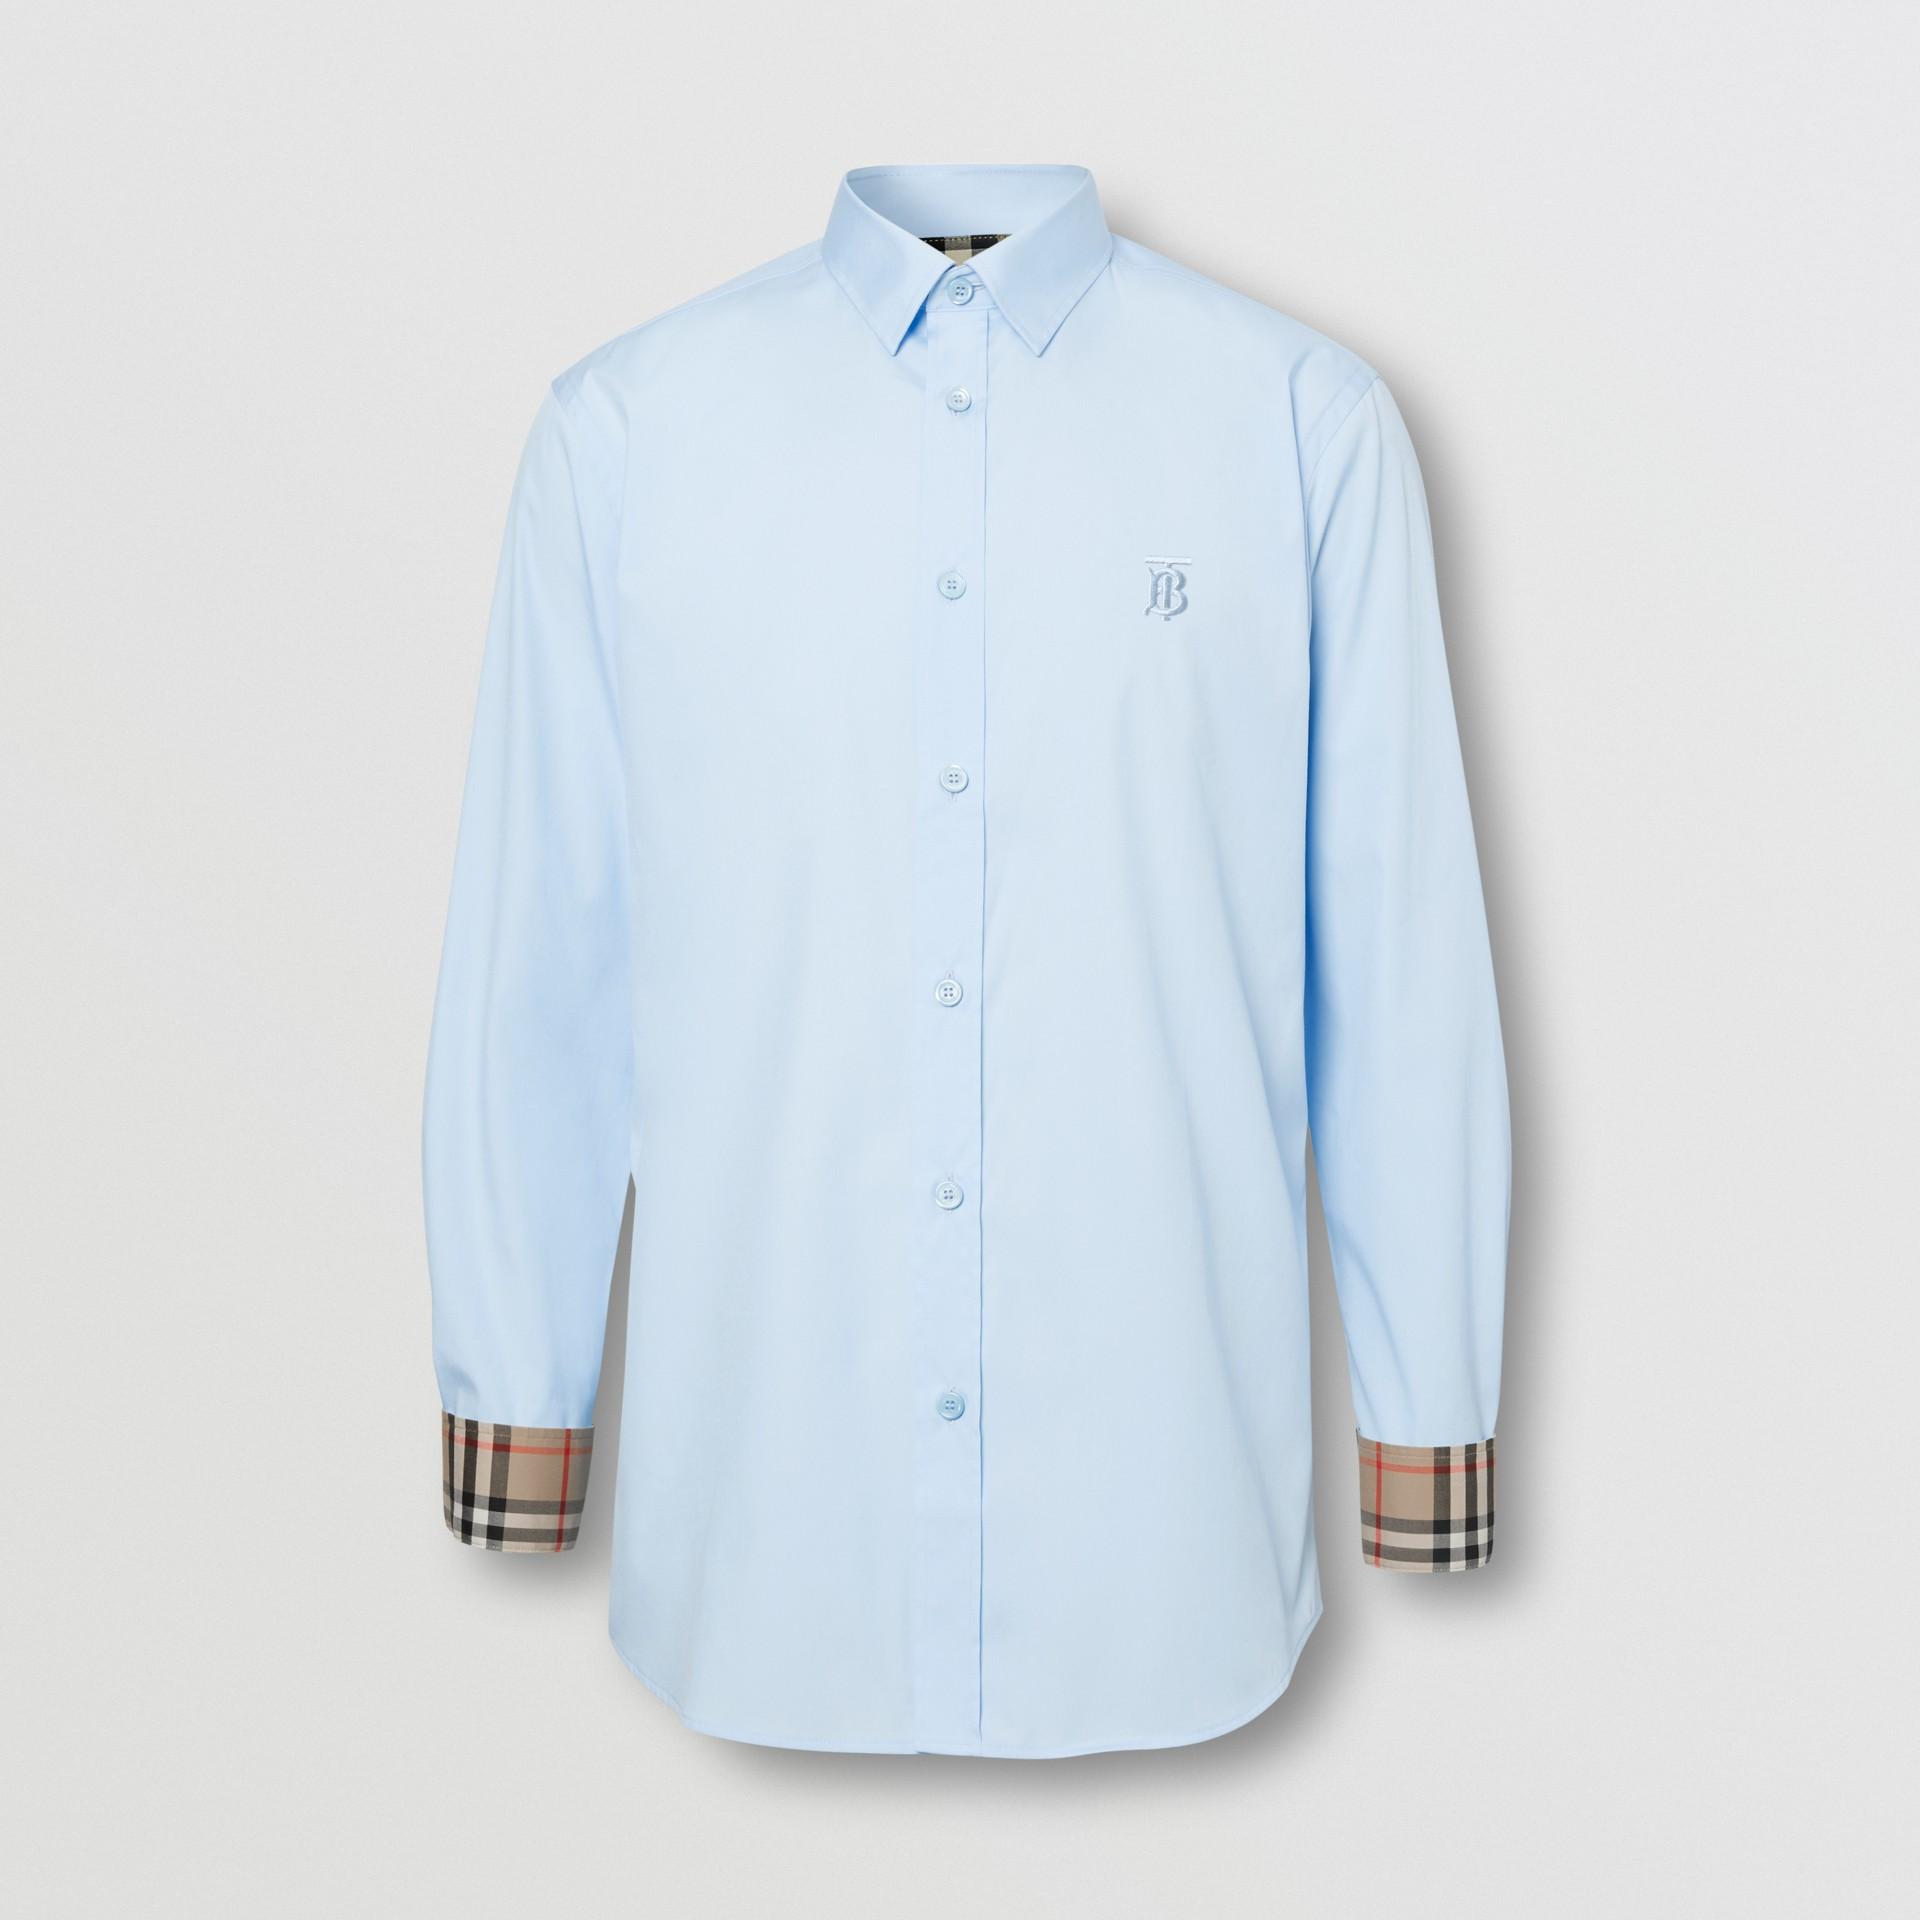 Monogram Motif Cotton Oxford Shirt in White - Men | Burberry - gallery image 6